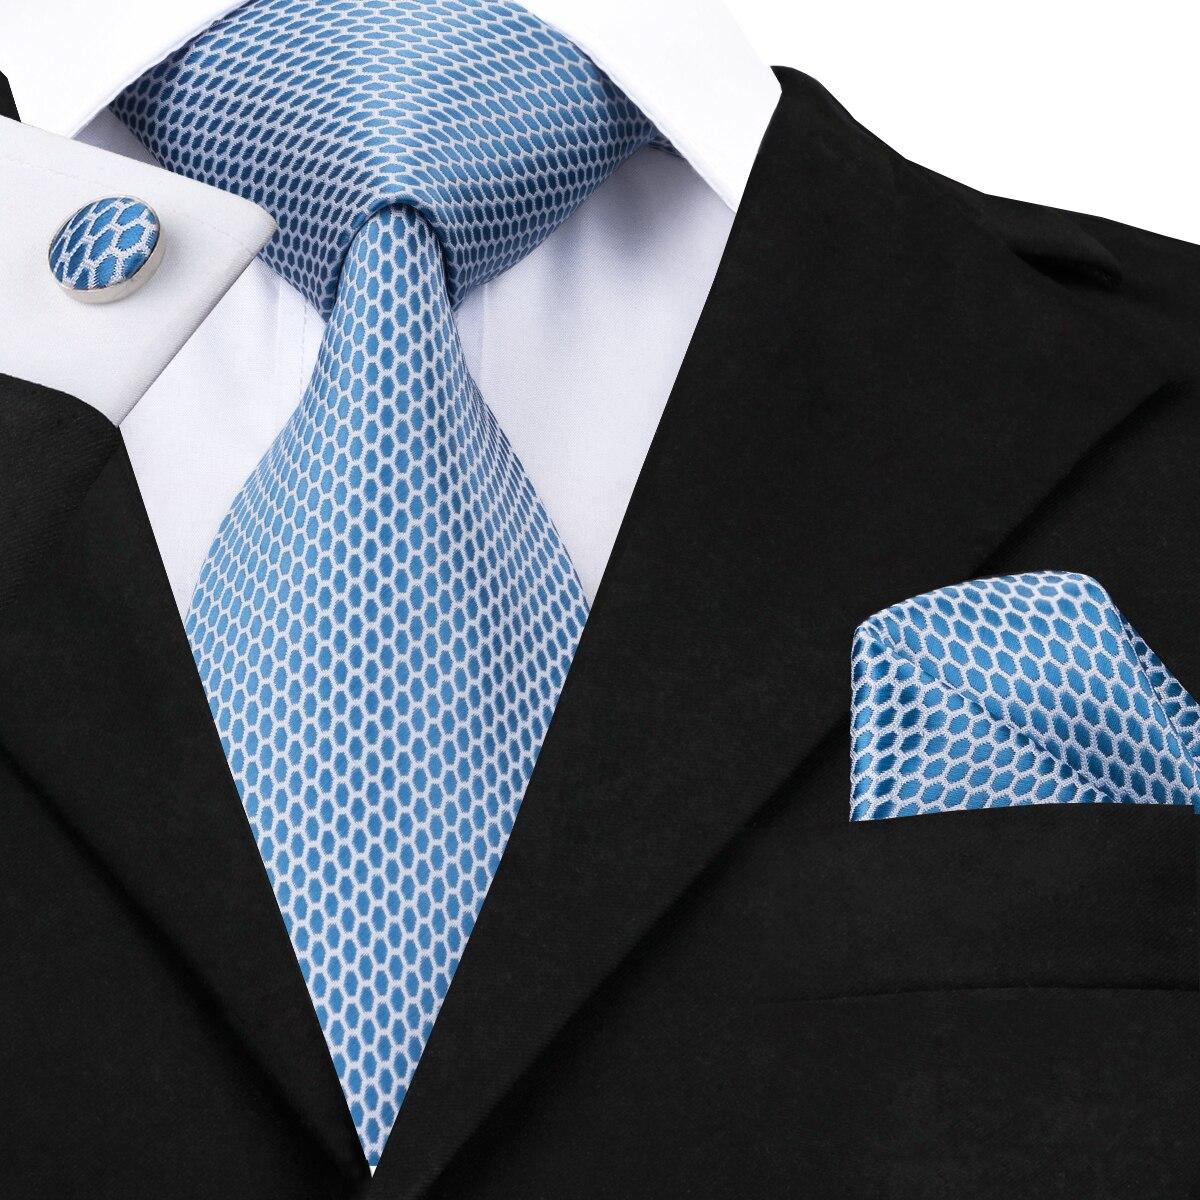 Hi-Tie Light Blue Fashion Polka Dot Ties Set For Men Silk Classic Men's Necktie Pocket Square Cufflinks Set Mens Ties  C-1535